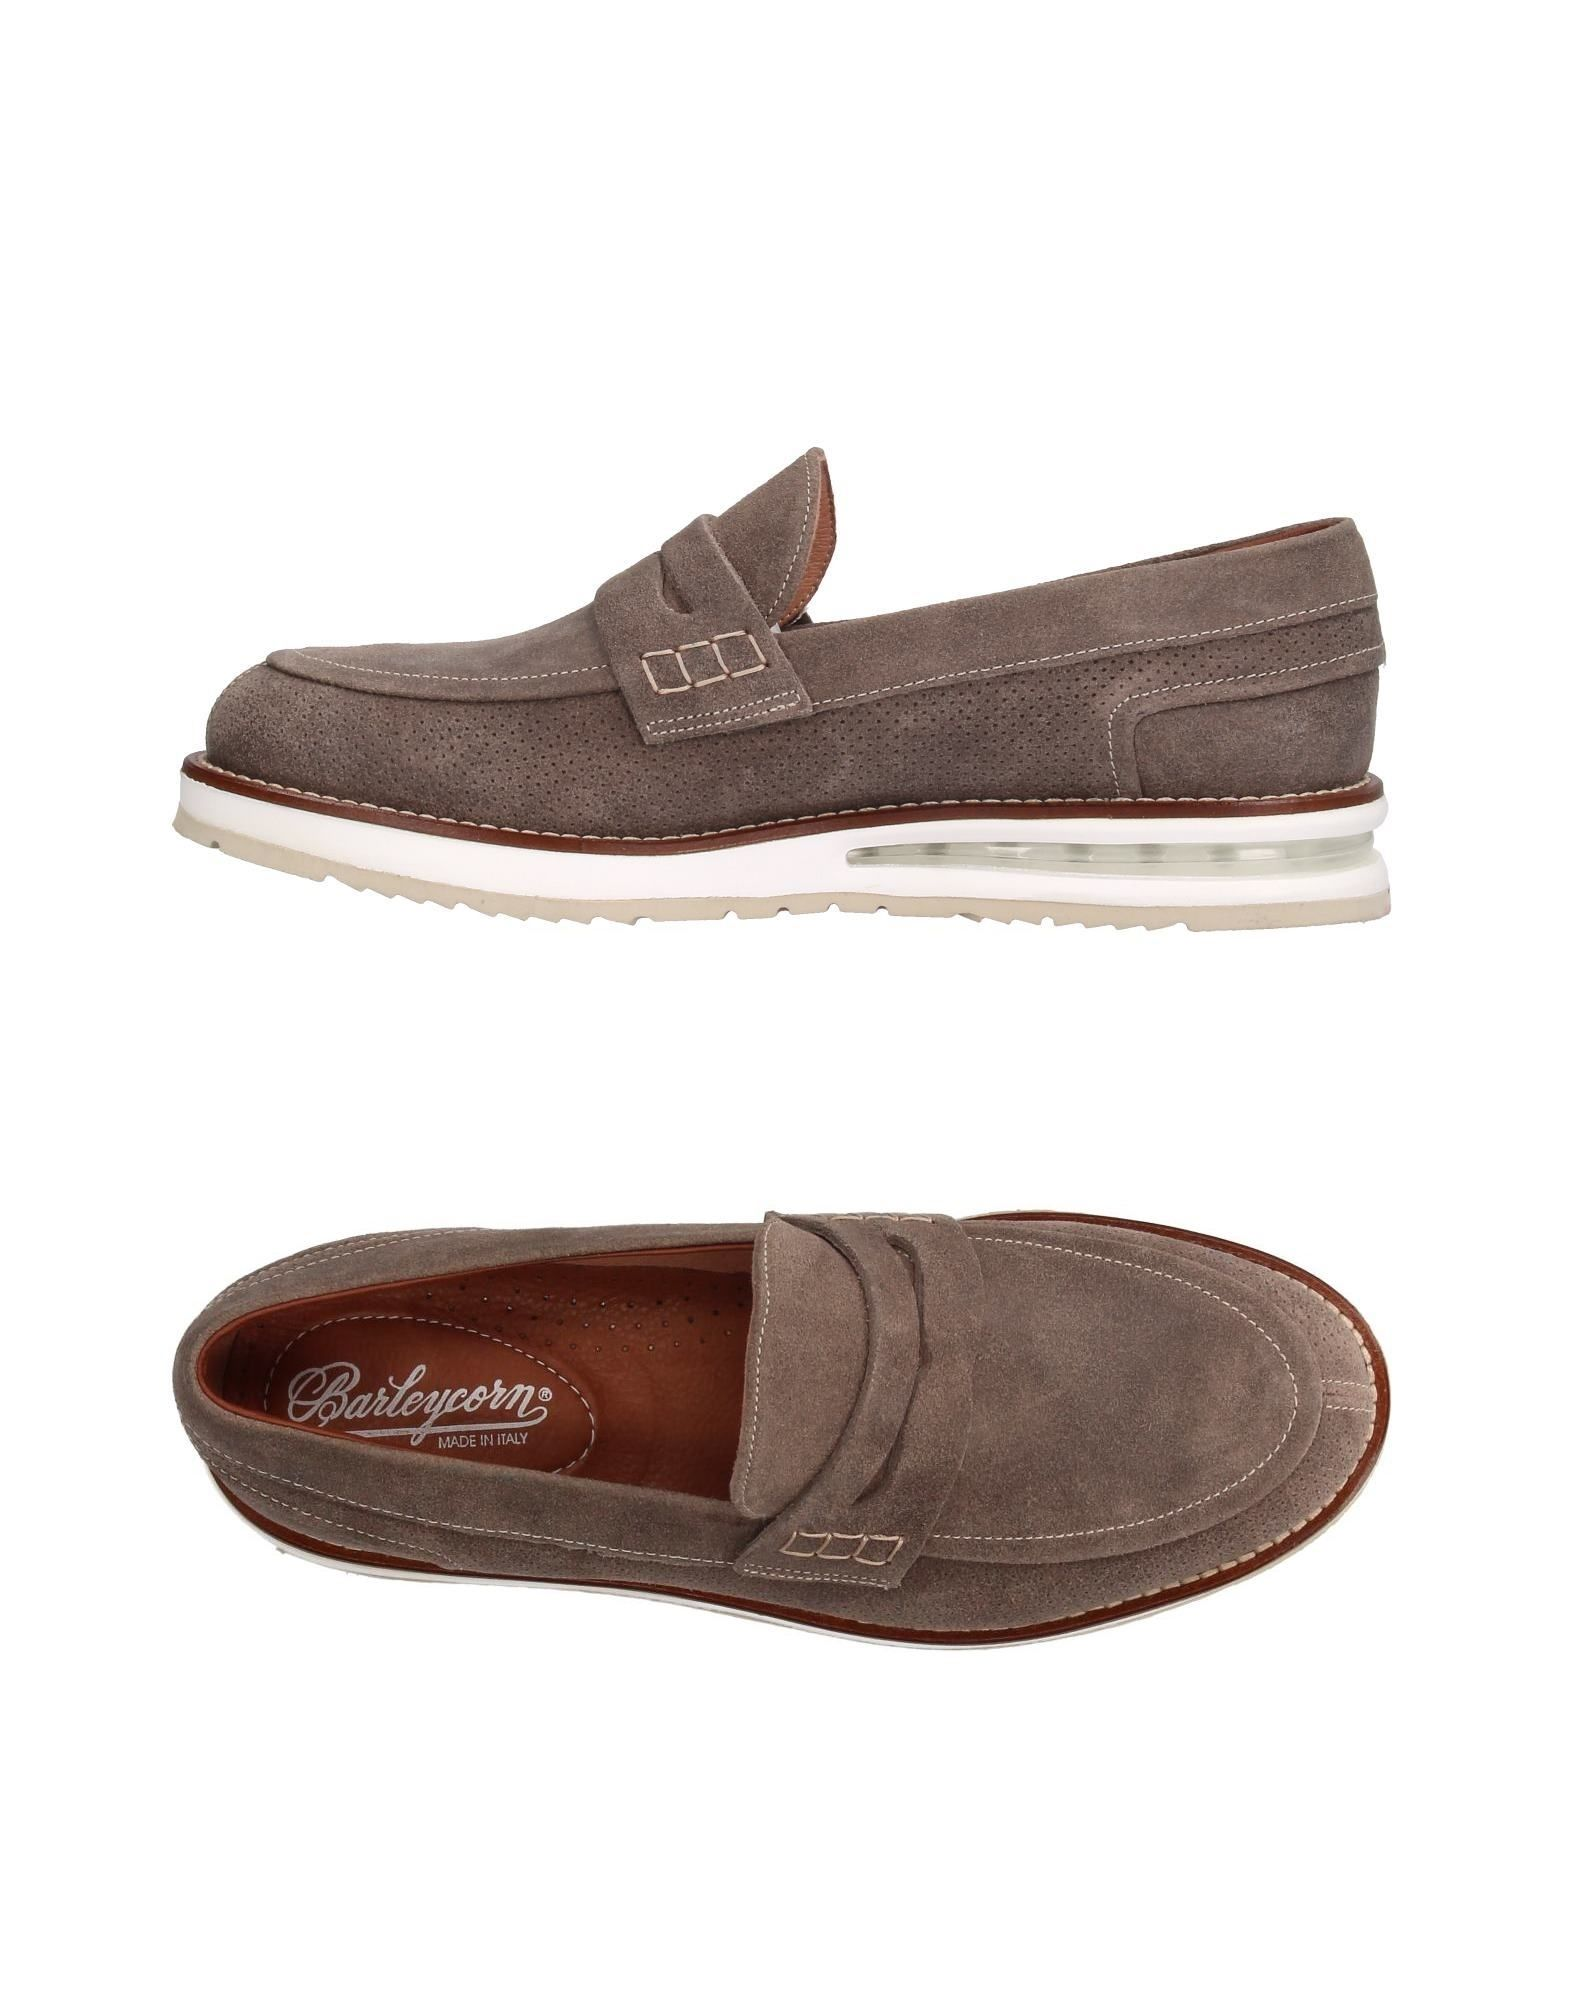 Rabatt Barleycorn echte Schuhe Barleycorn Rabatt Mokassins Herren  11198640MM 37a991